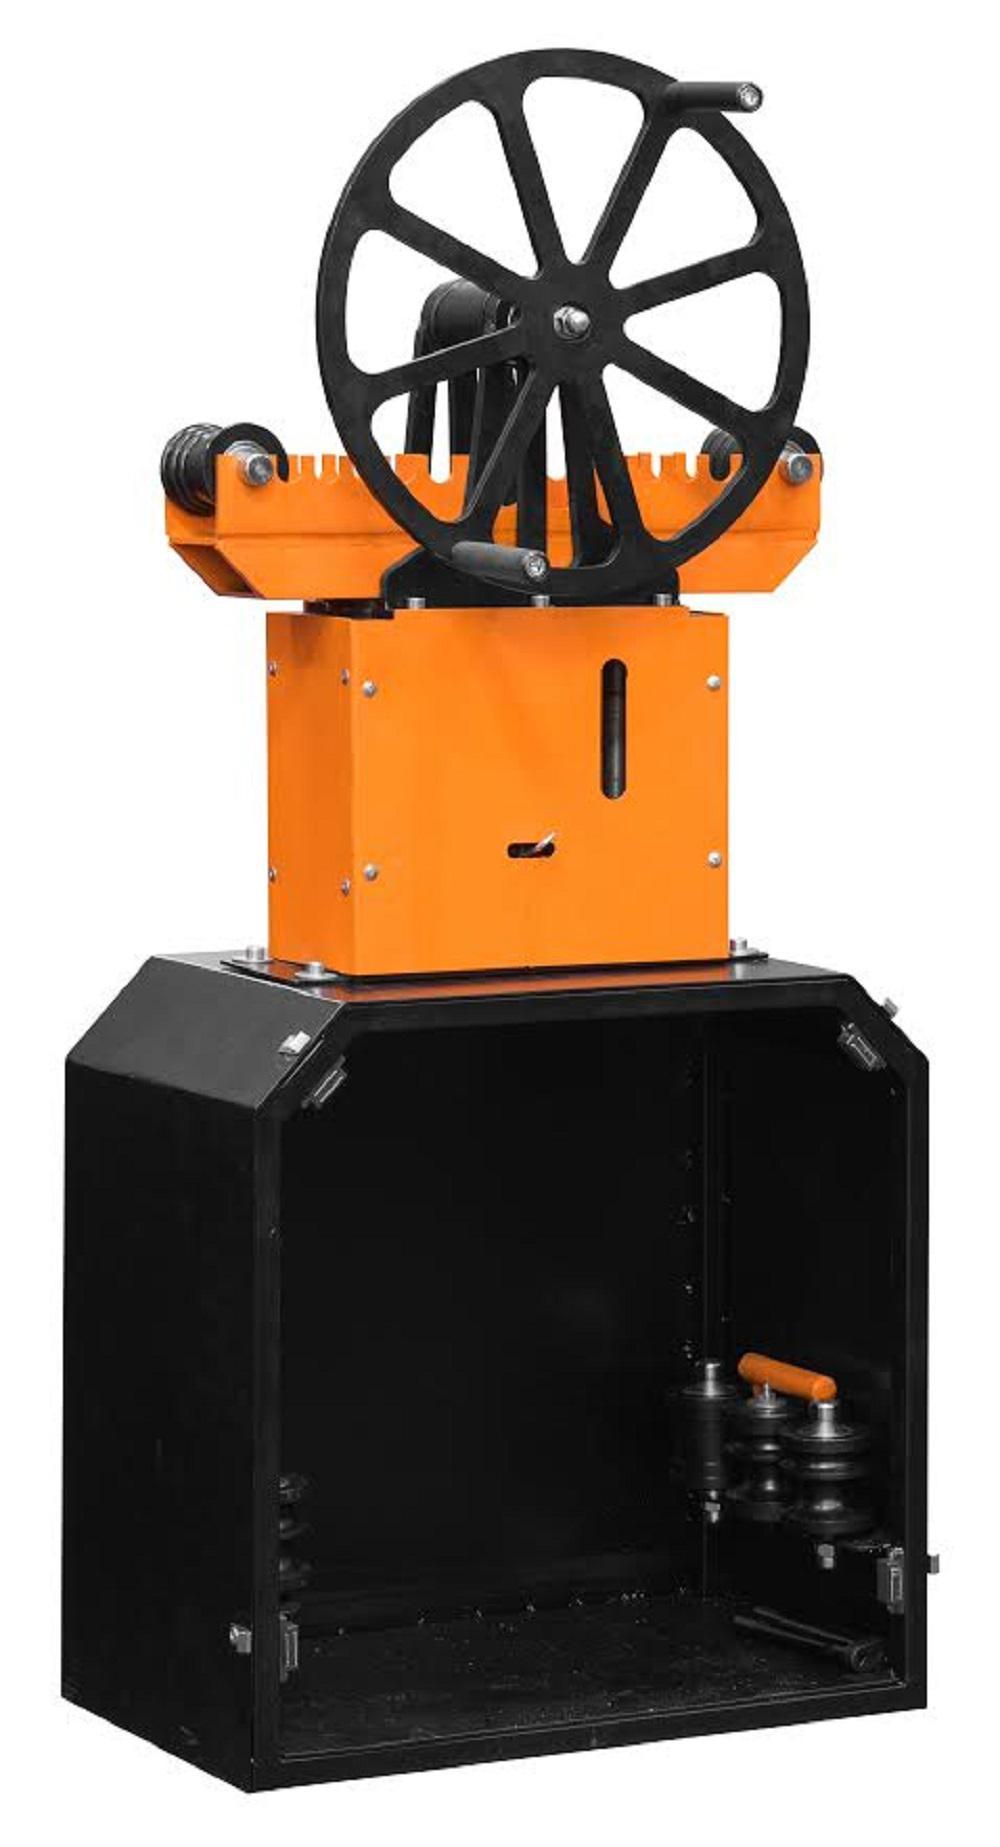 Трубогиб Stalex Hb-60 premium (100879)